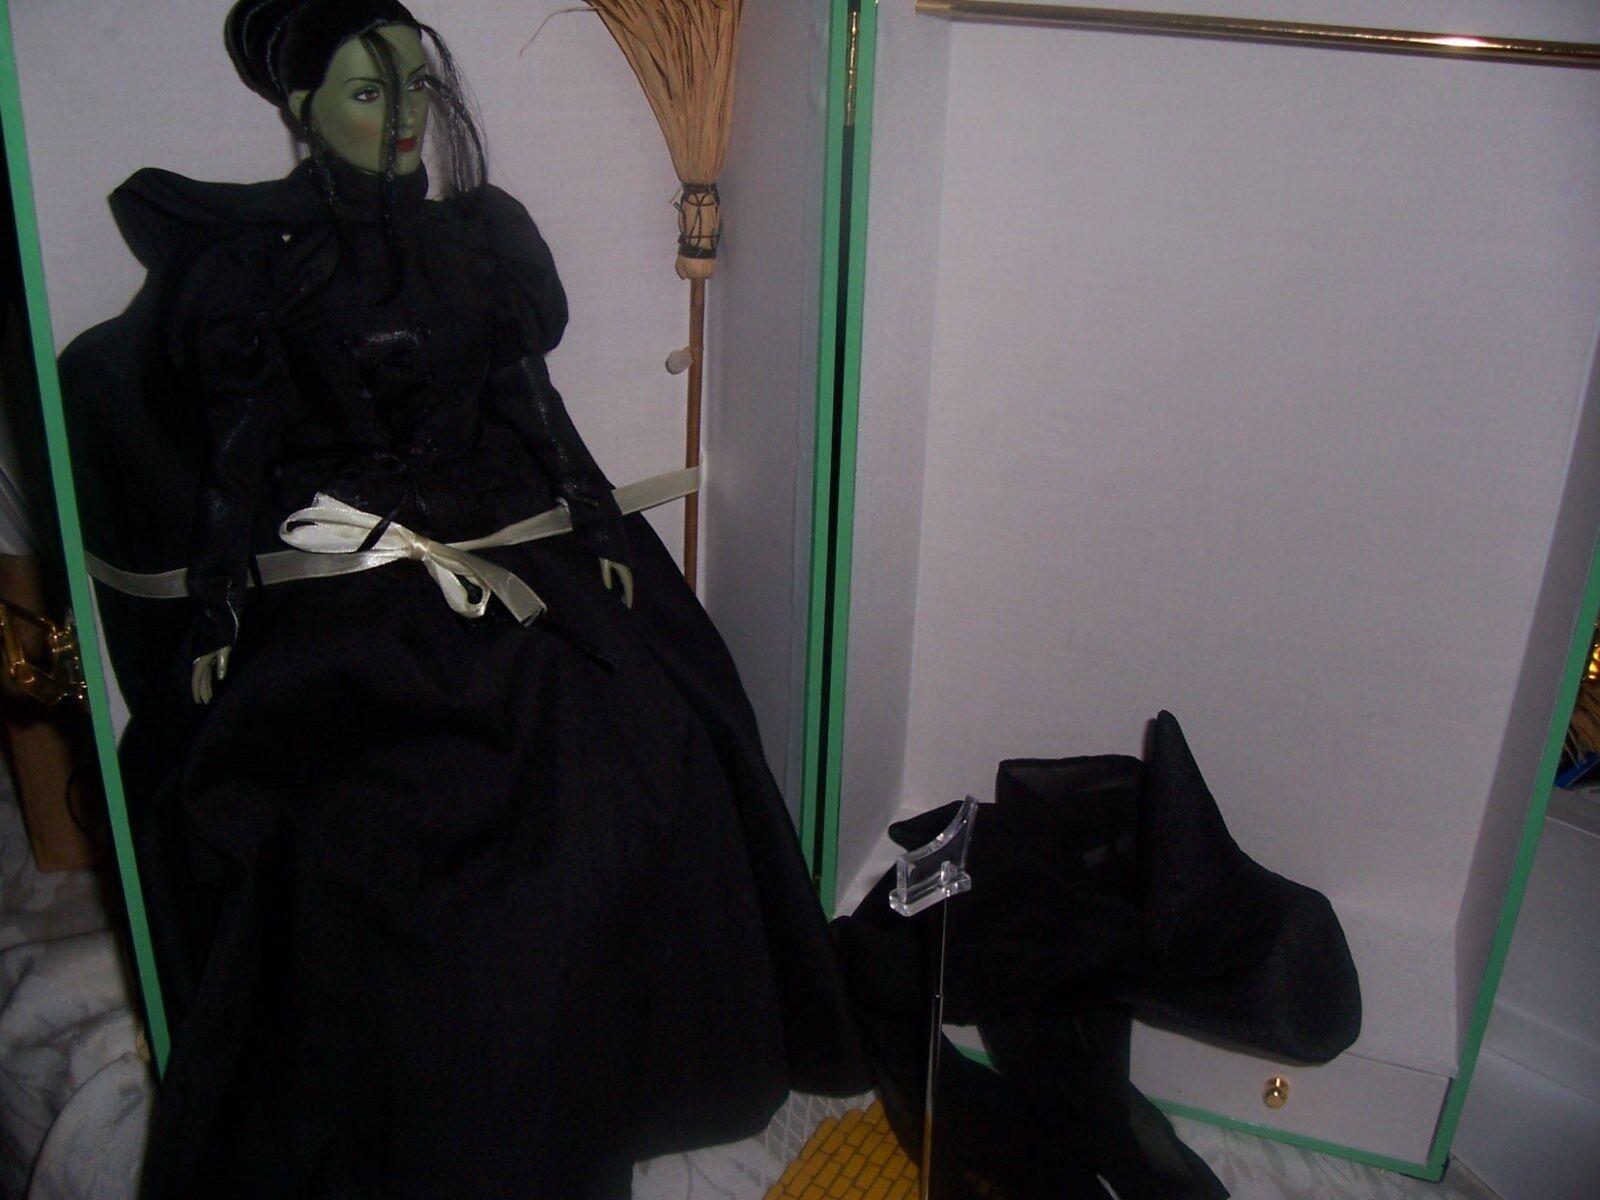 Tonner asistente OZ Tronco Set 16  Vinilo Muñeca En Conjunto + Sombrero de bruja, escoba + base